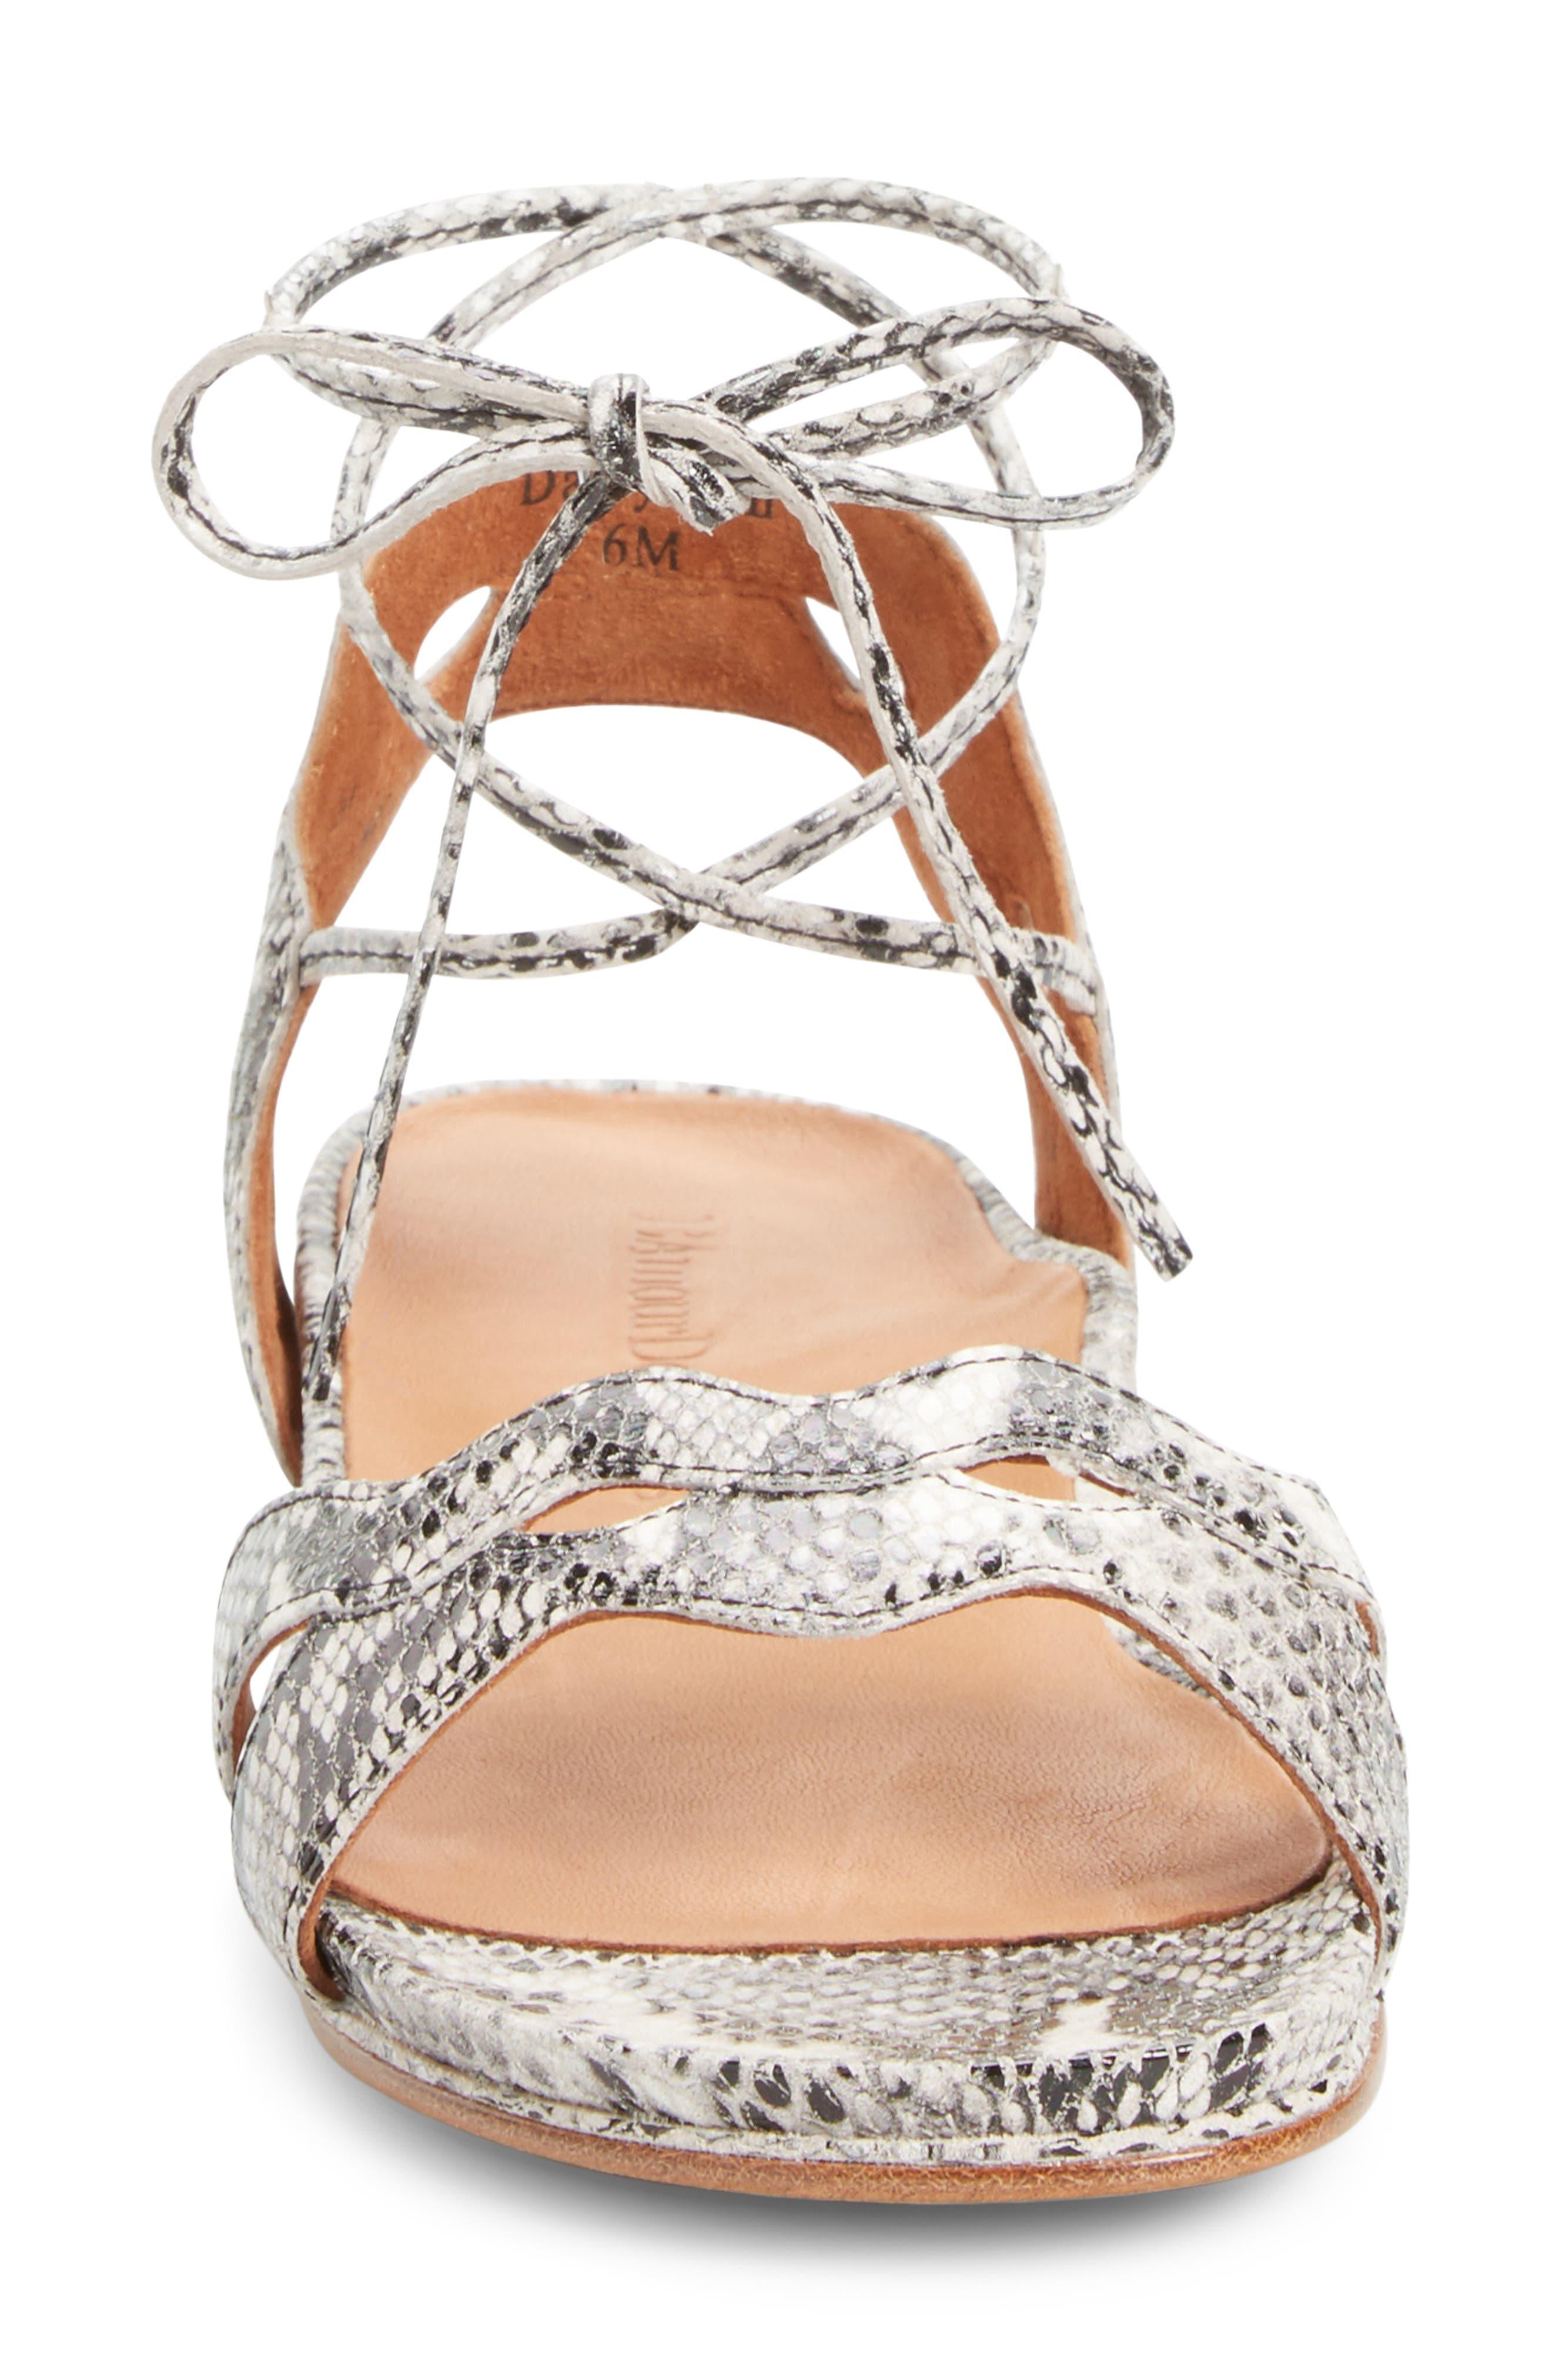 Darrylynn Wraparound Lace-Up Sandal,                             Alternate thumbnail 3, color,                             002